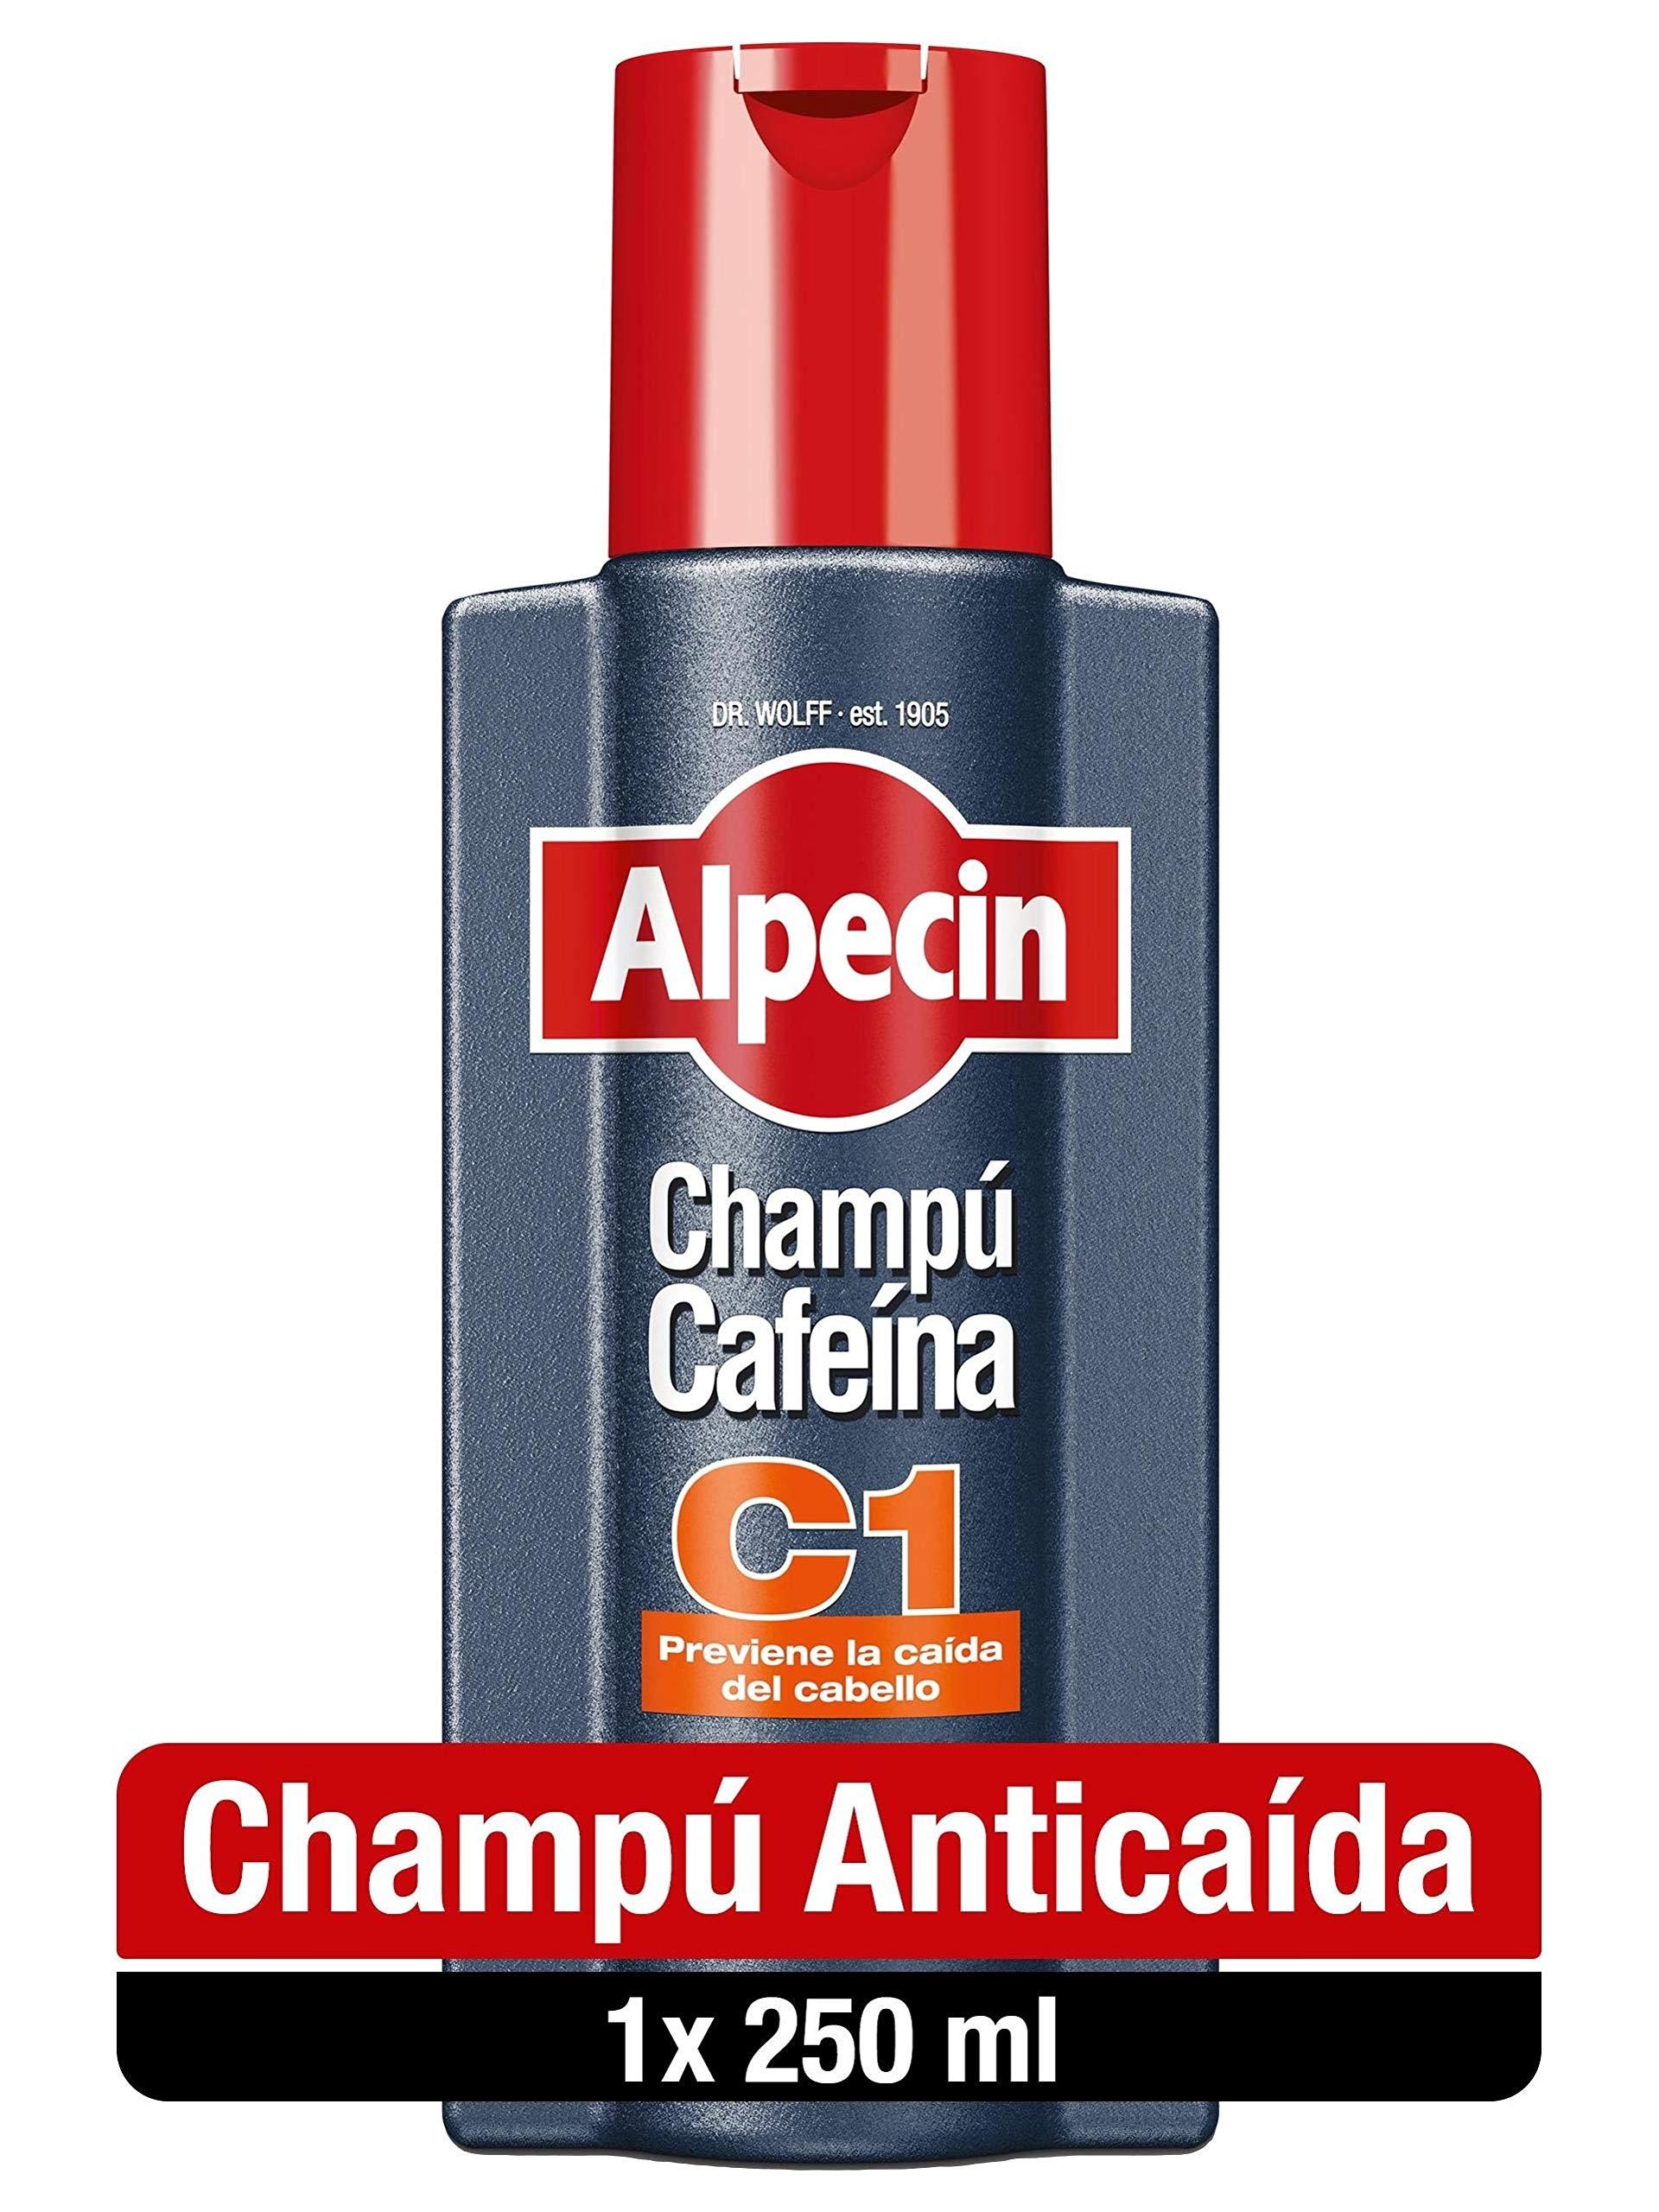 Alpecin Coffein-Shampoo C1 - 8.45 oz /250 ml - fresh from Germany